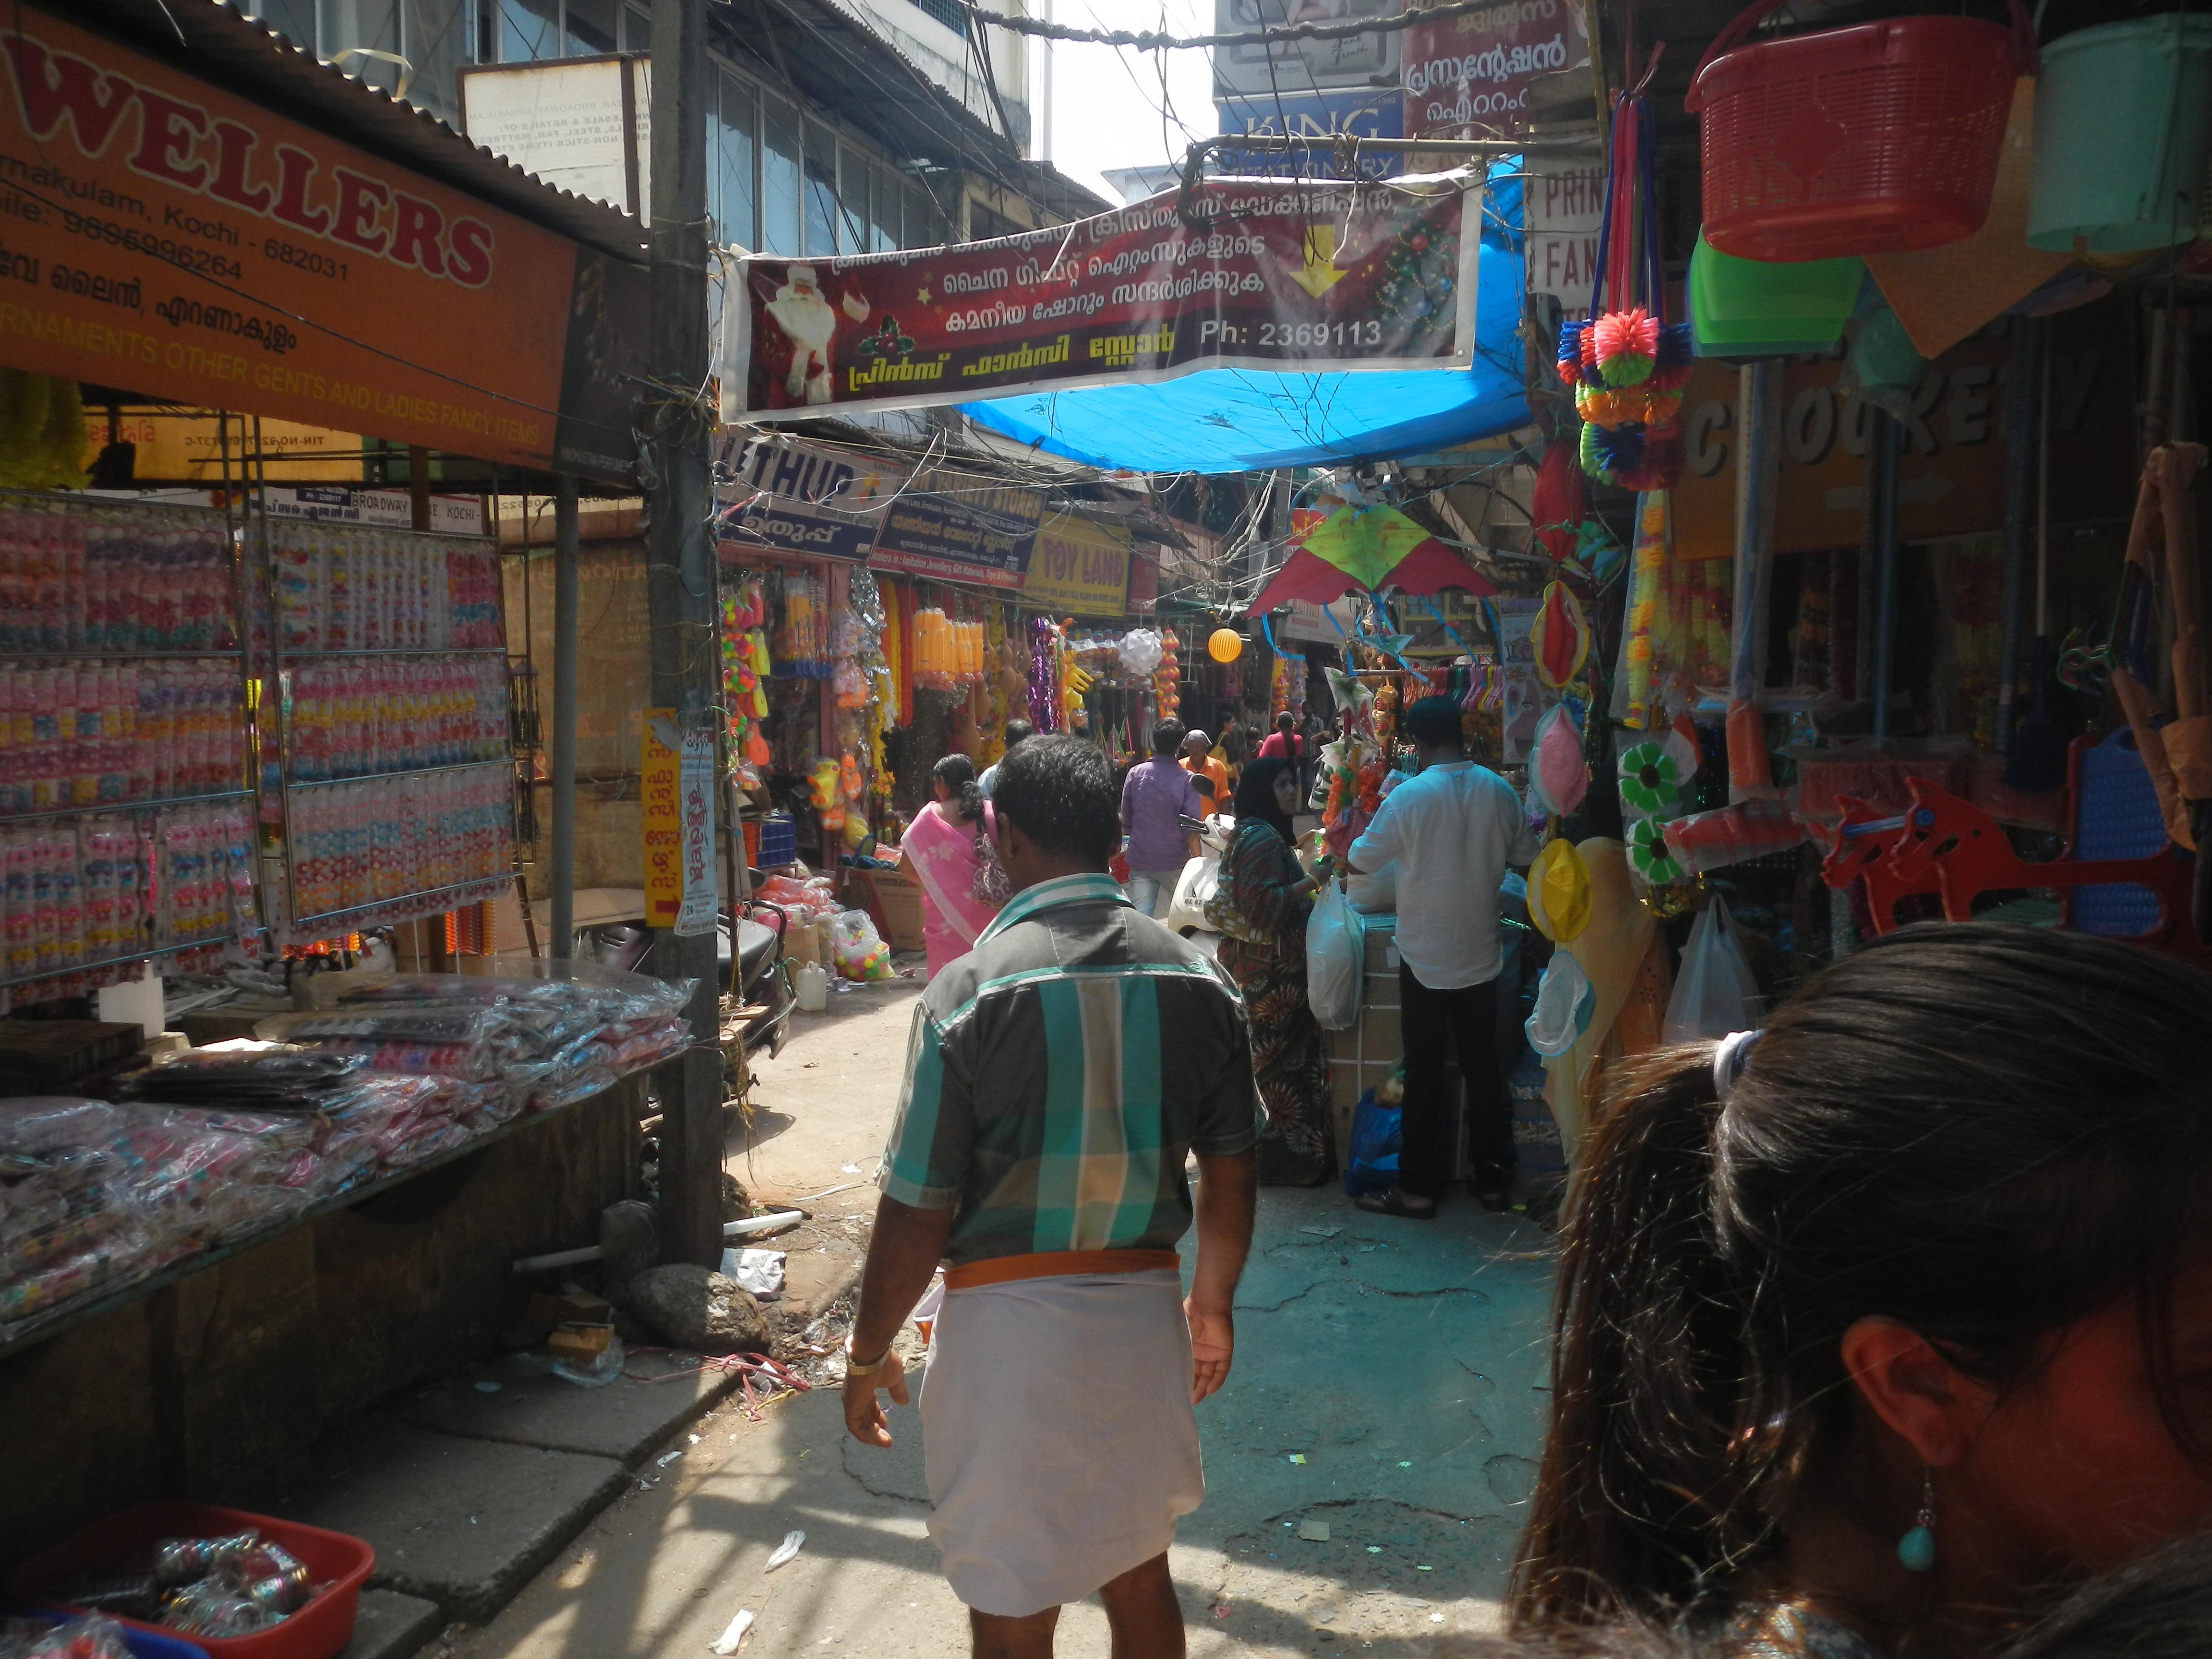 Market, Kochi, Kerala, India